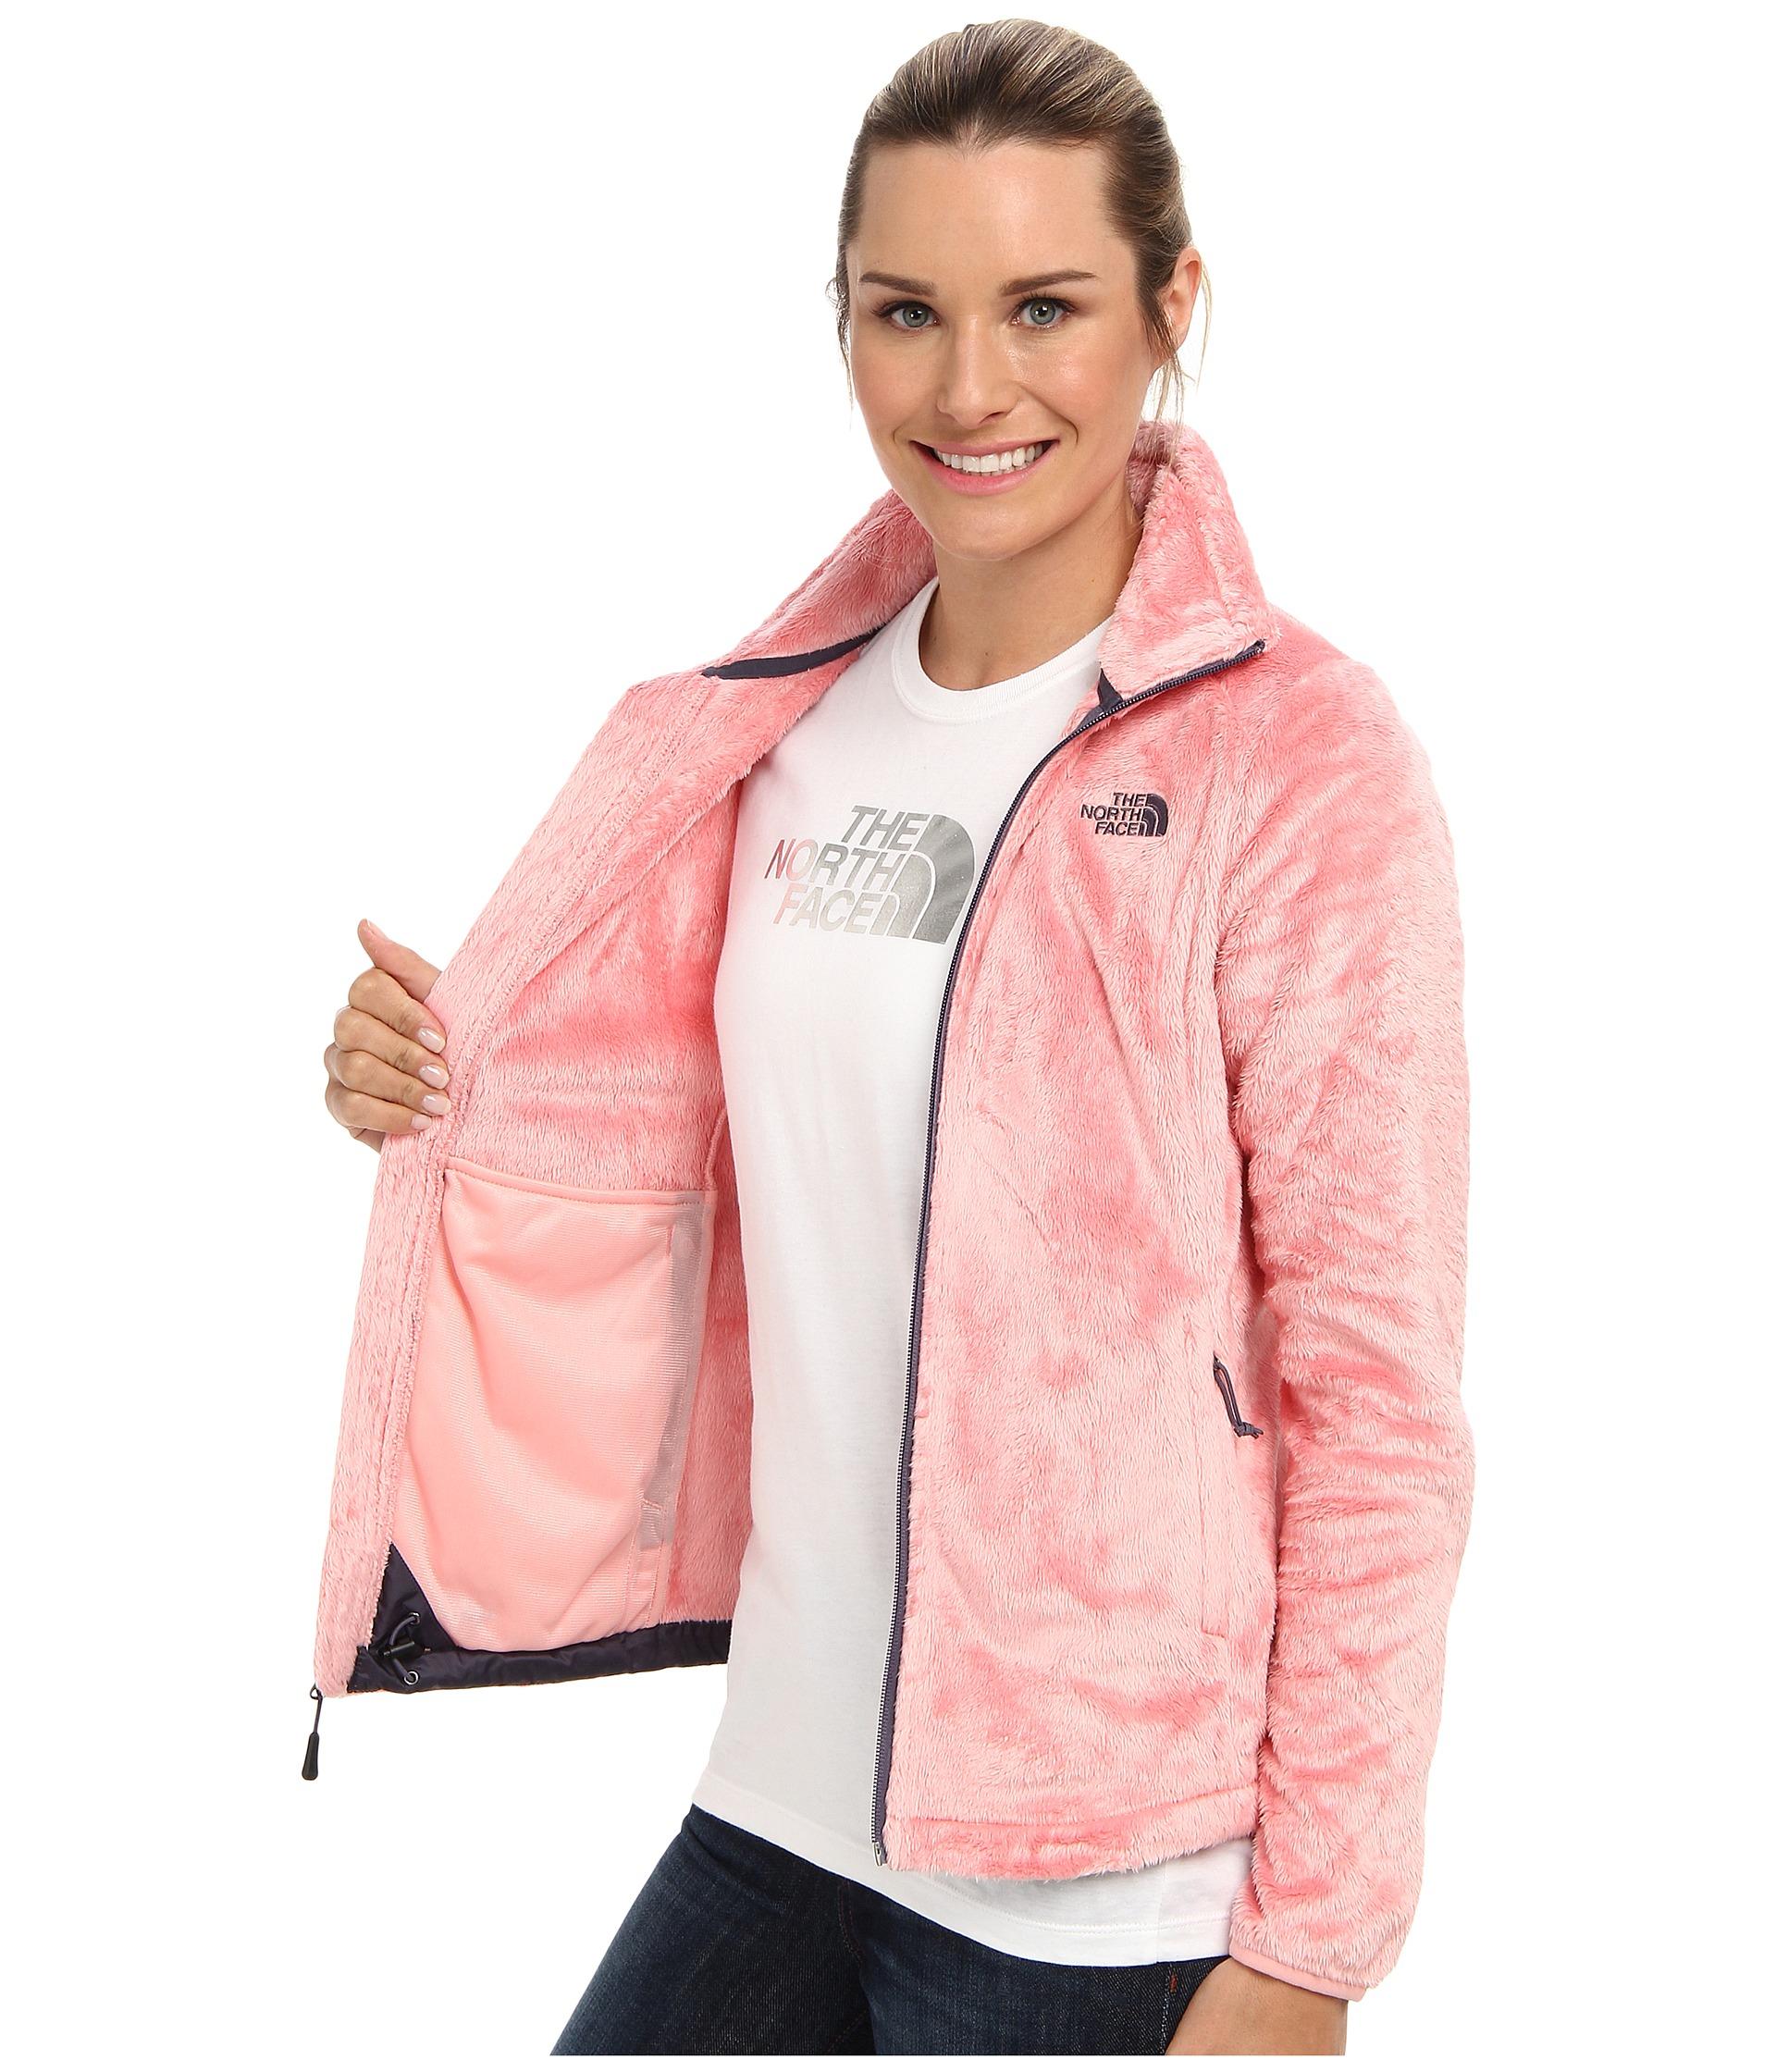 e9268cec6 Women's Pink Osito 2 Jacket